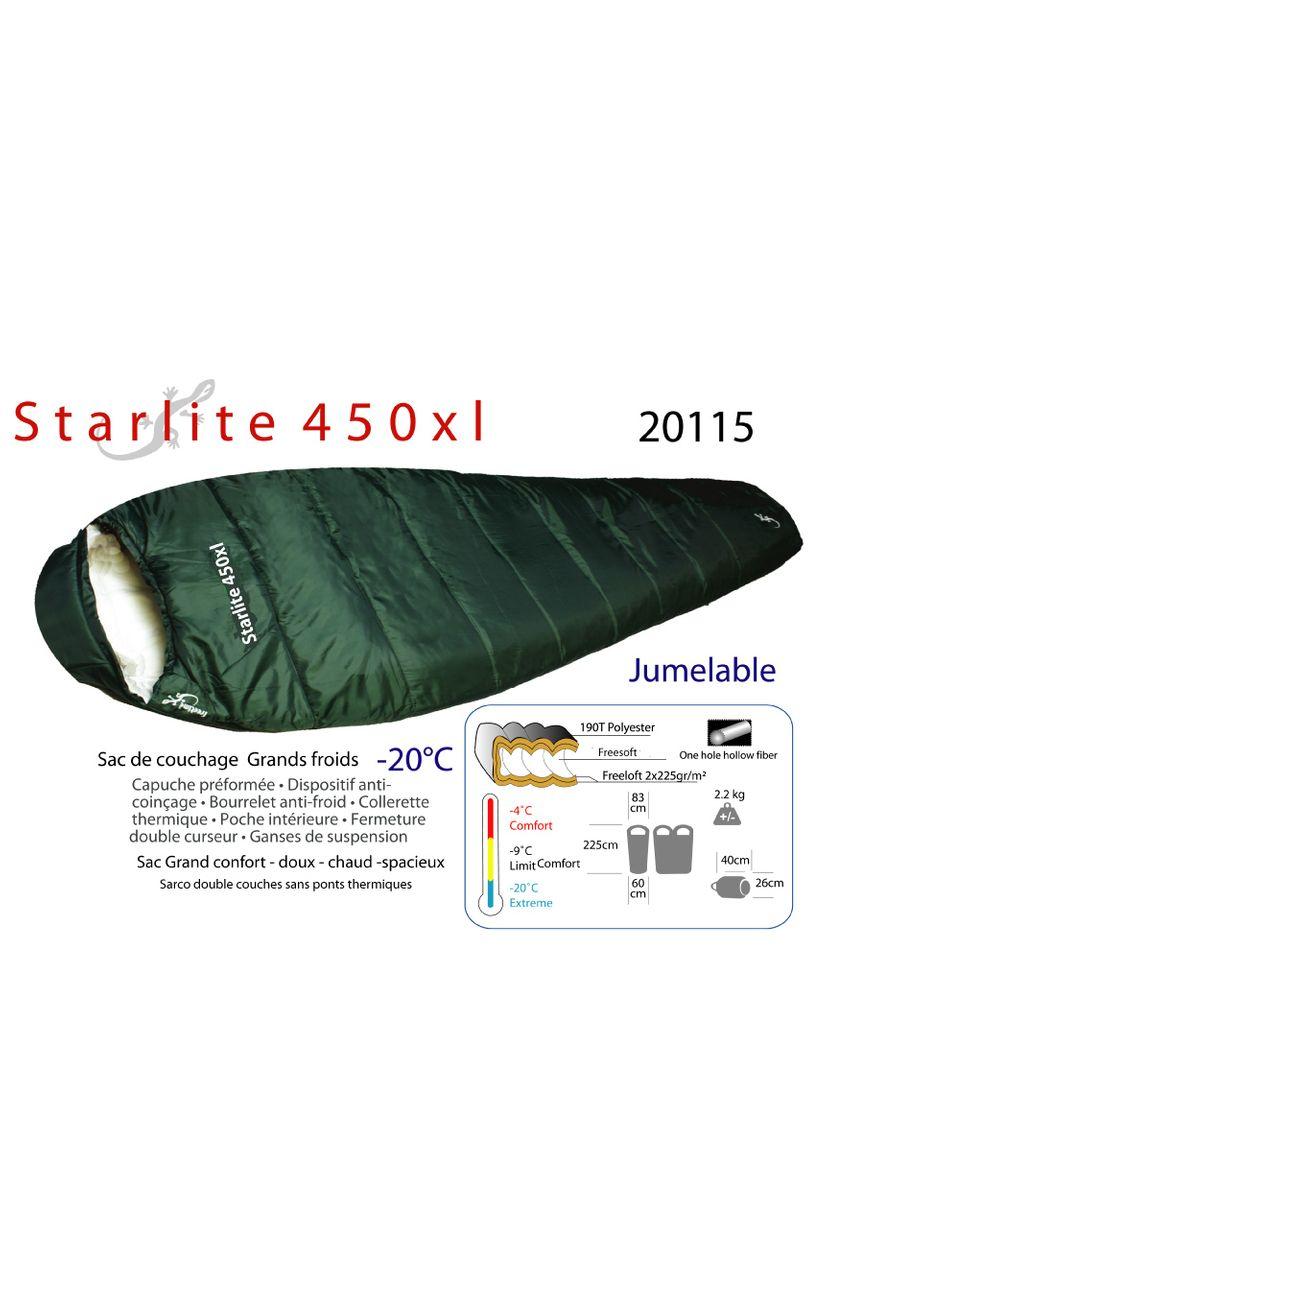 Starlite 450xl sacs de couchage 20 c sac couchage grand froid 4 saisons sac grande taille - Taille citronnier 4 saisons ...